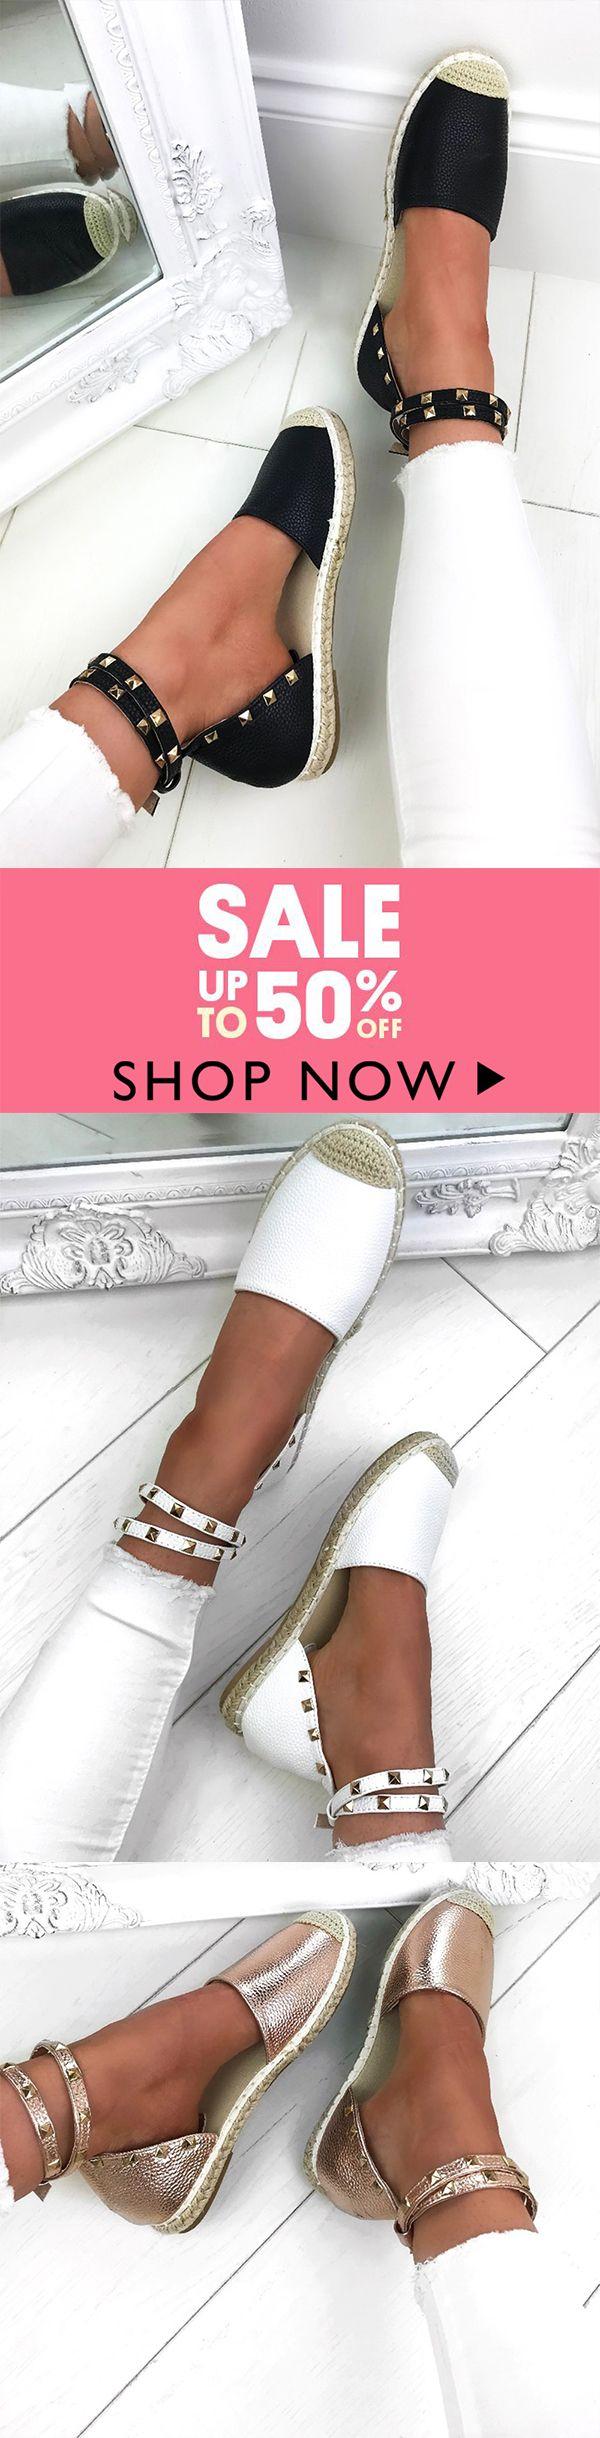 1000+bought !!!  Casual Weaving Adjustable Buckle Flat Sandals – sheinlook